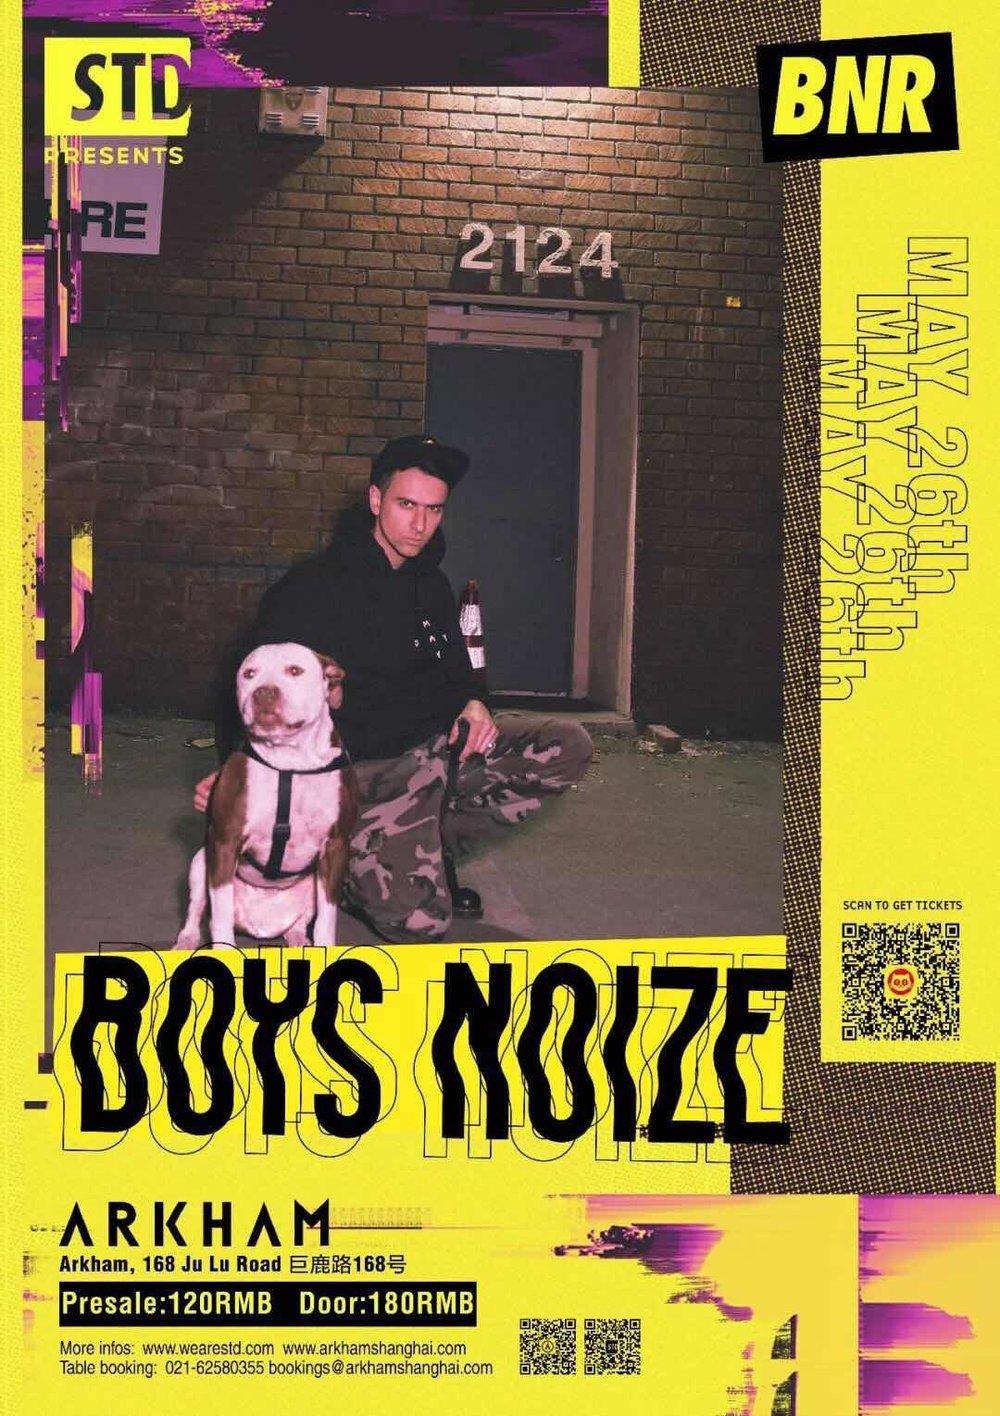 boysnoizeposter.jpg